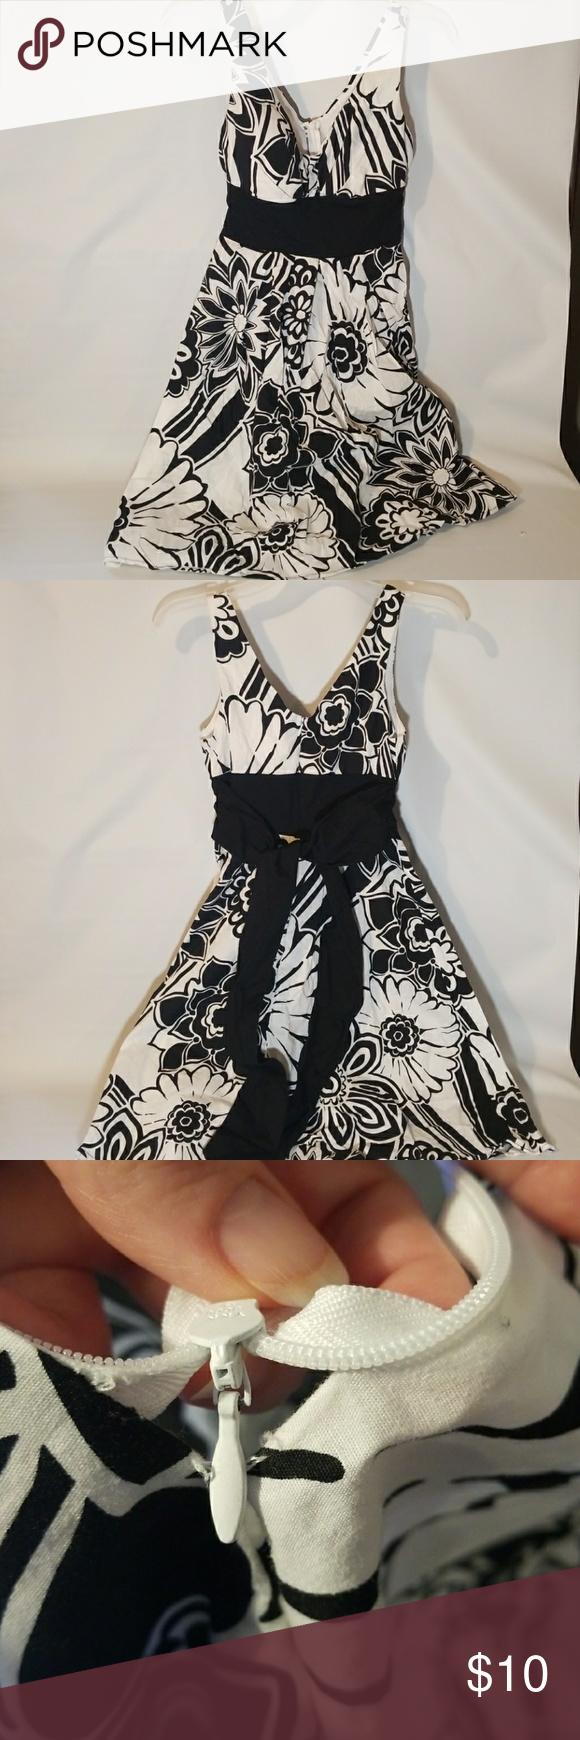 Black And White Flower Dress 4 B Smart Black And White Flower Dress